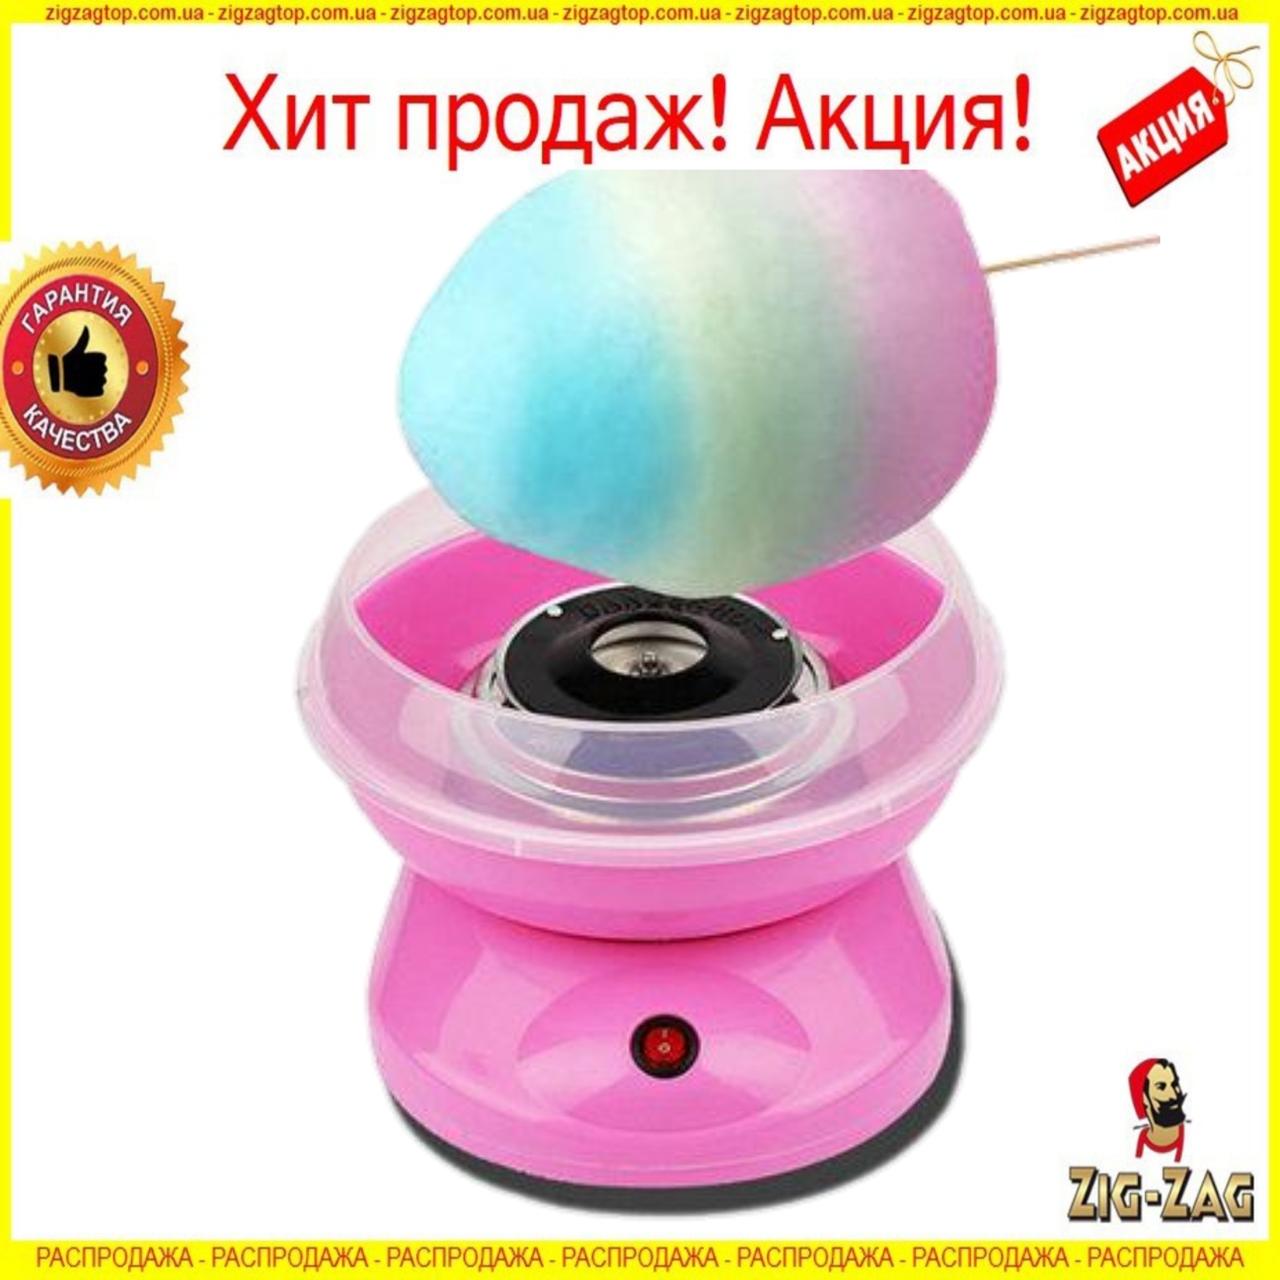 Апарат для приготування солодкої цукрової вати Cotton Candy Maker будинку своїми руками, Солодка вата ТОП ПРОДАЖ